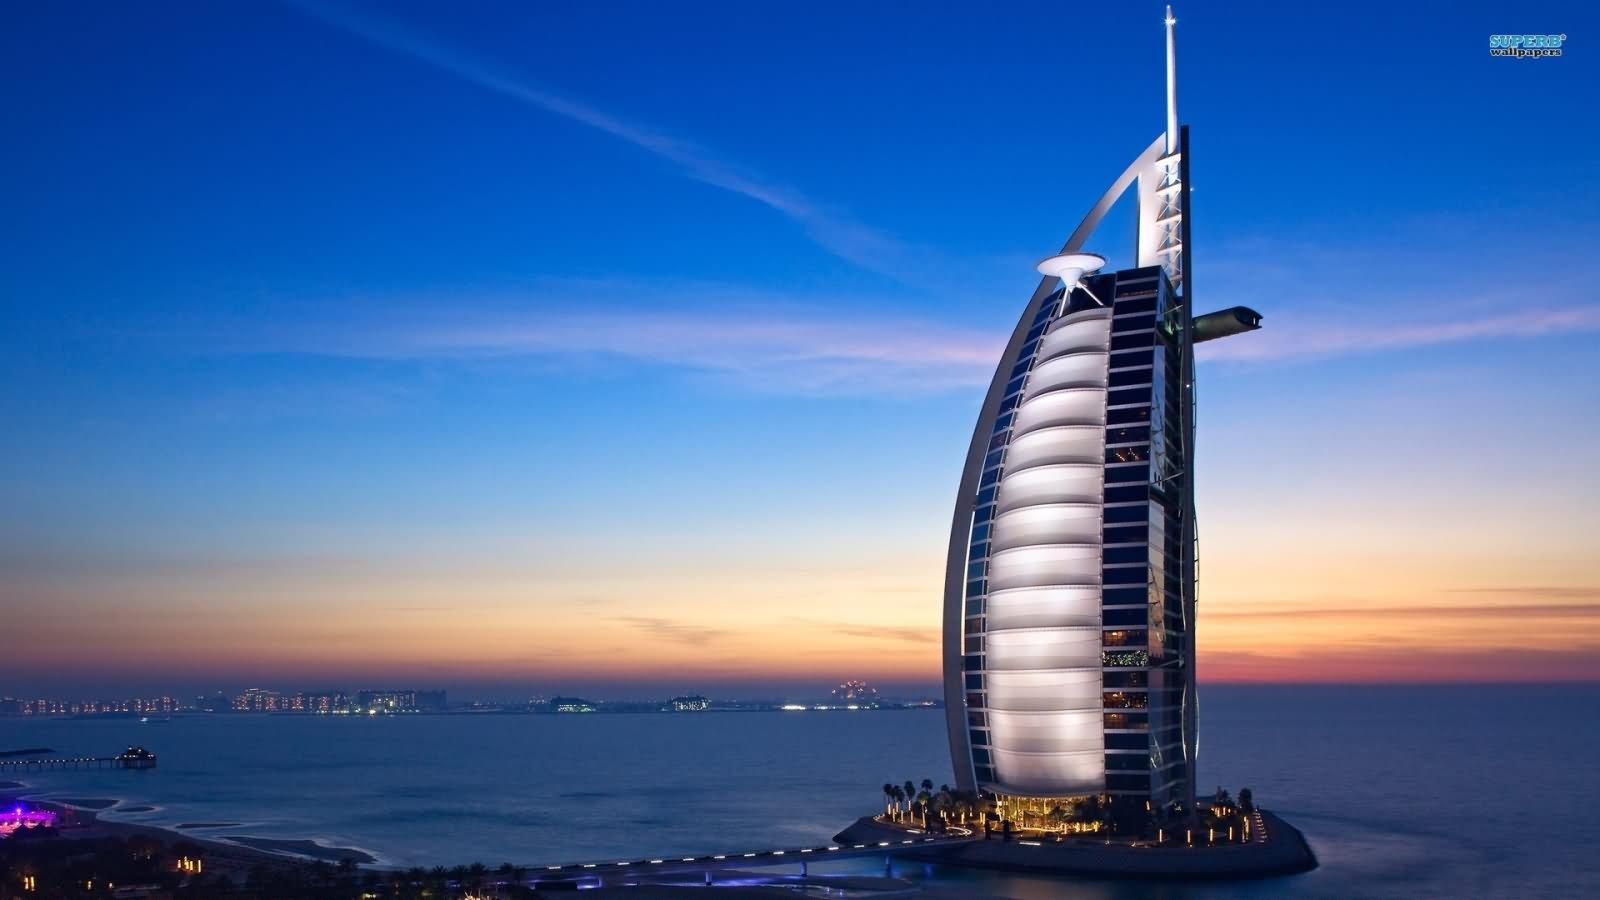 40 most beautiful burj al arab, dubai pictures and photos